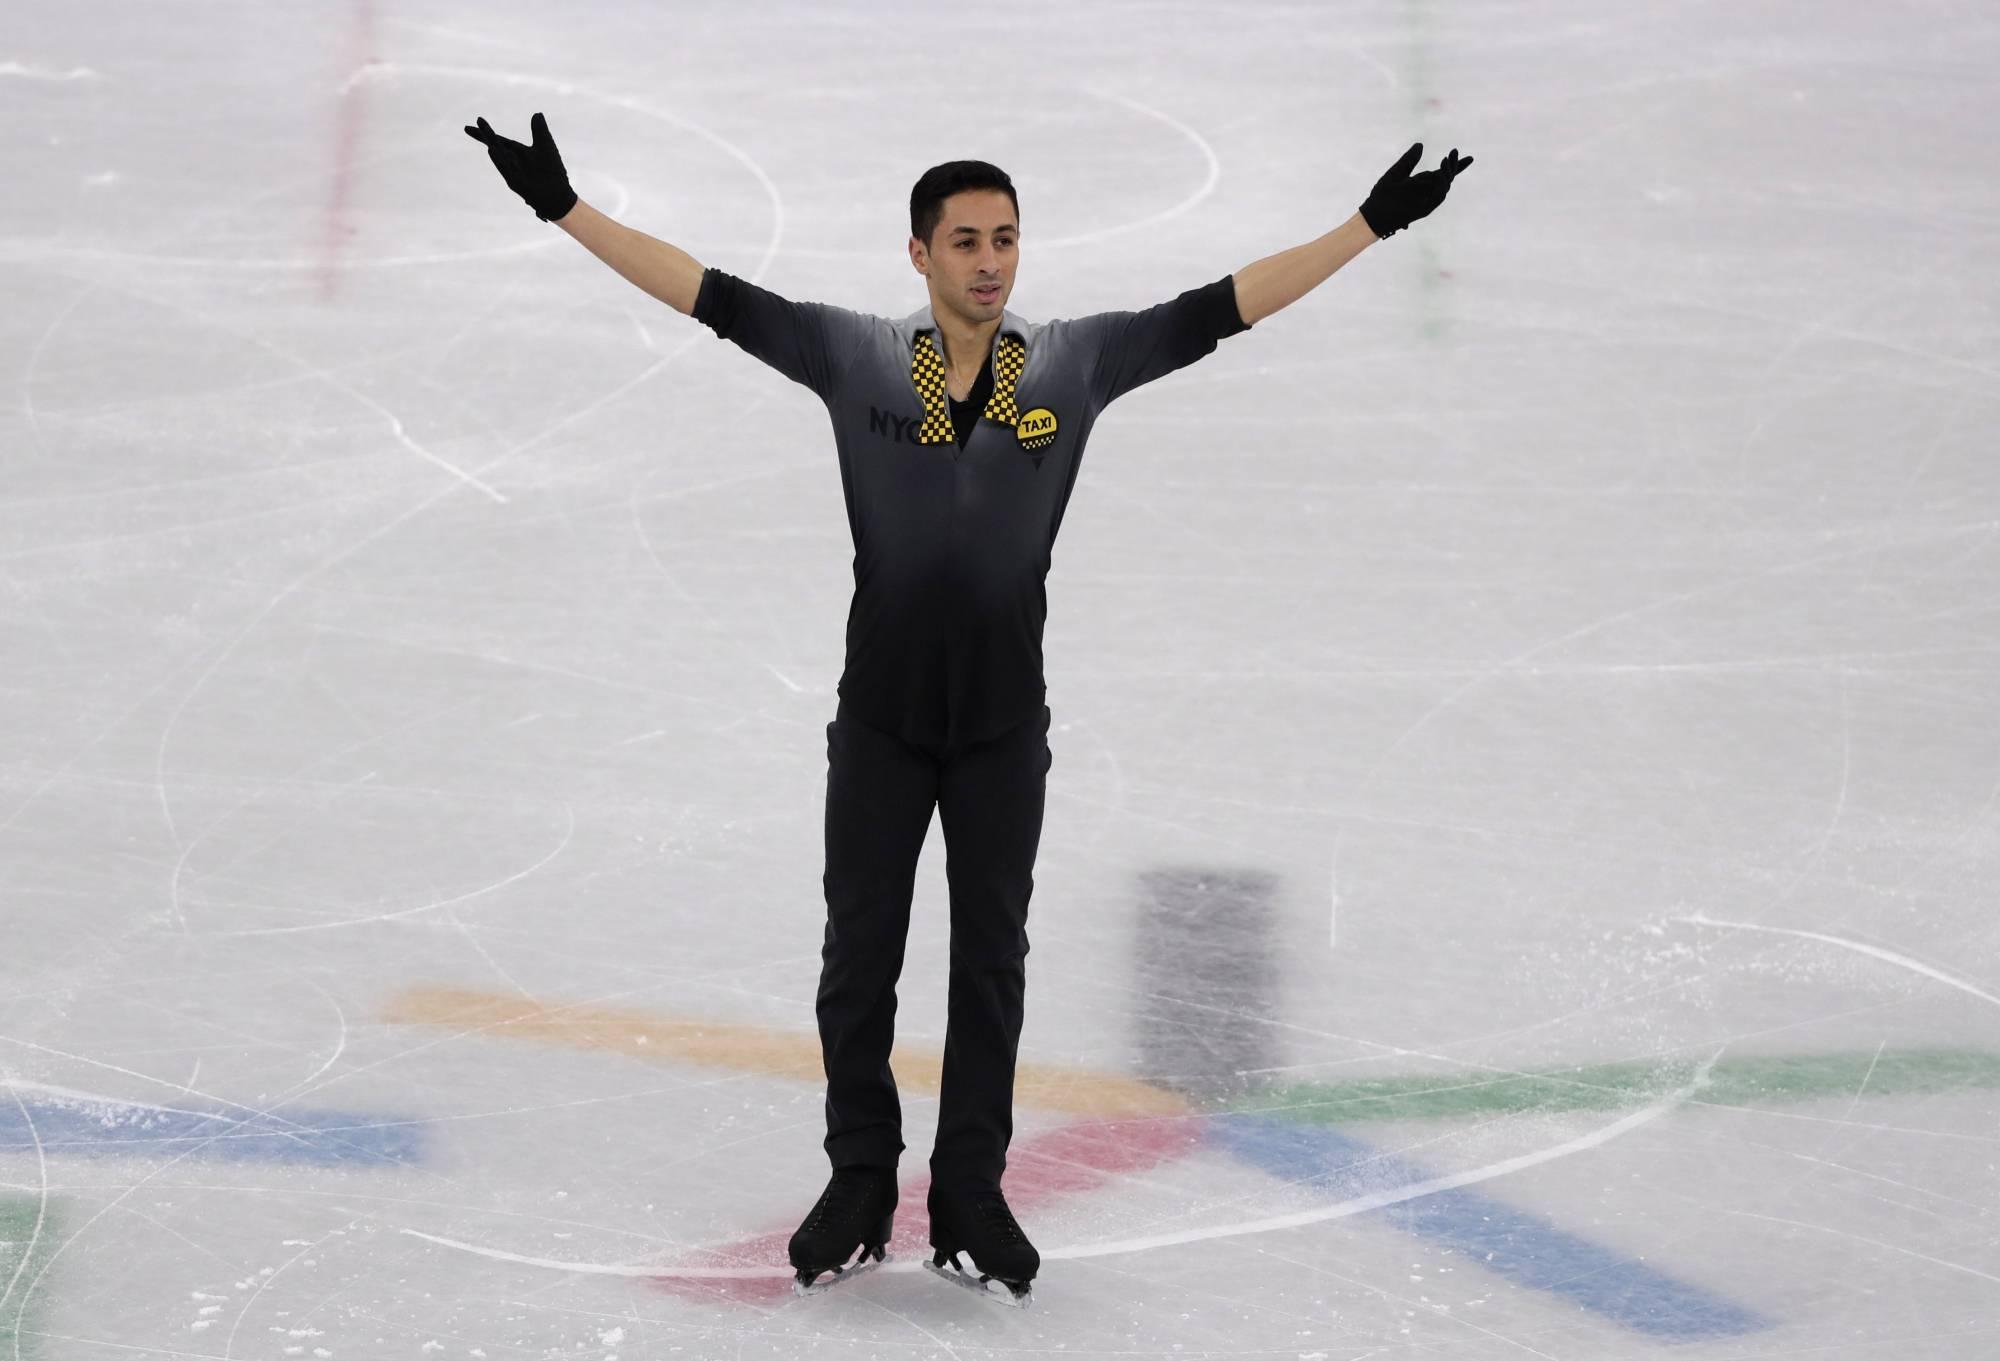 The Latest: Spotlight on united Koreas in ceremony, on ice ...